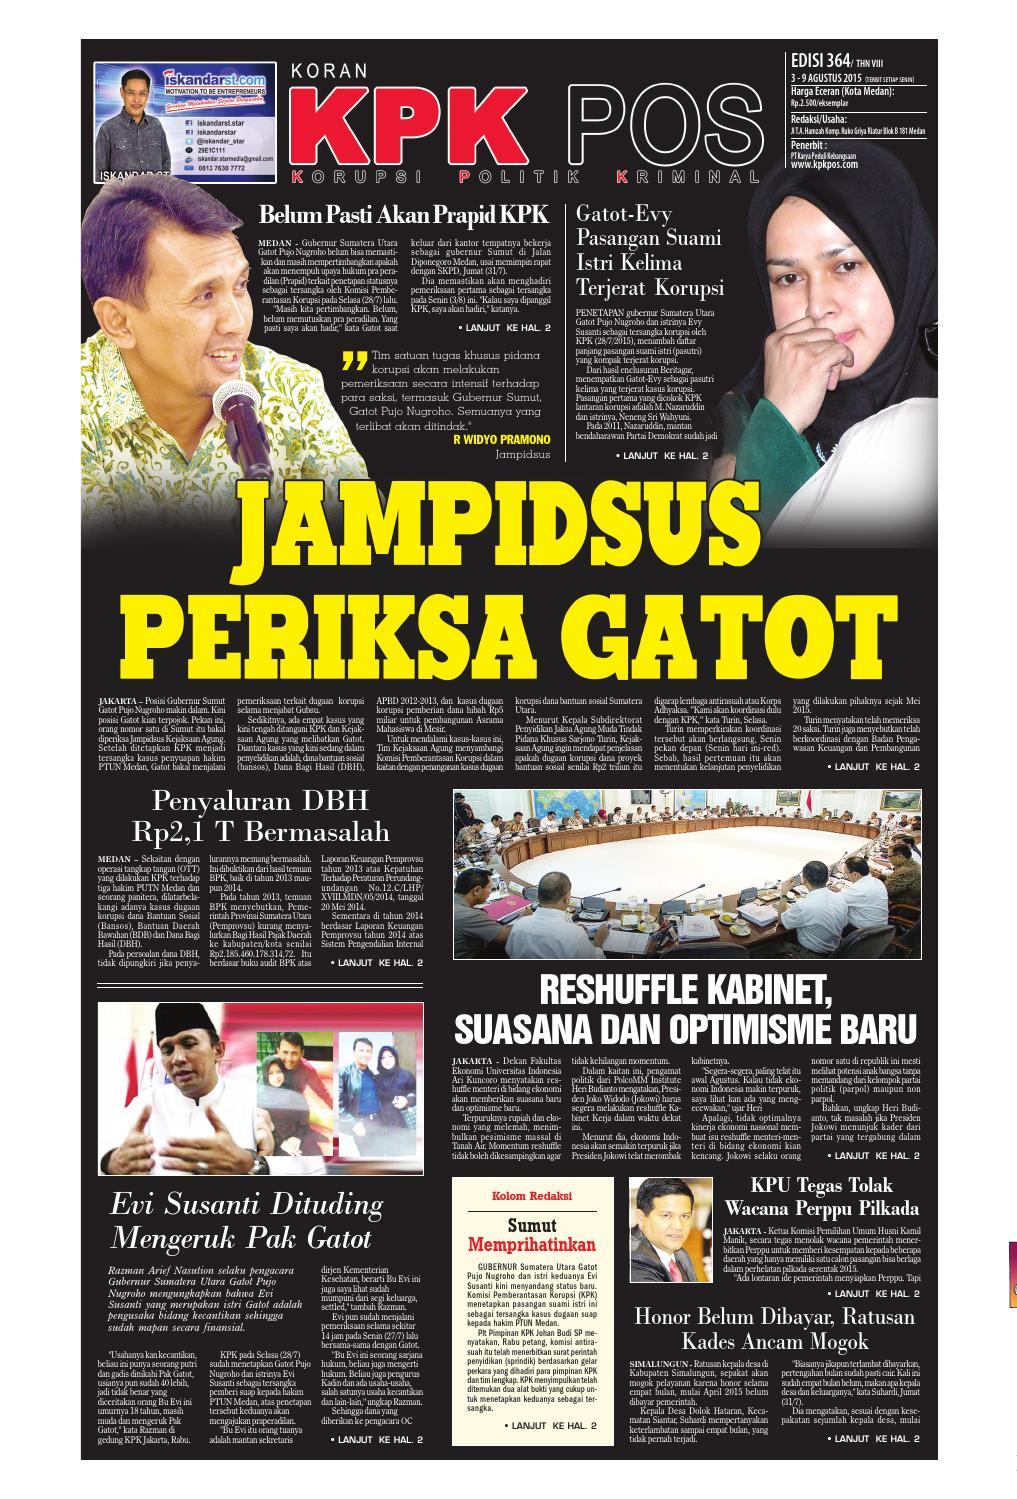 Epaper Kpkpos 364 Edisi Senin 3 Agustus 2015 By Media Andalas Issuu Produk Ukm Bumn Kue Sagu Ikan Haruan